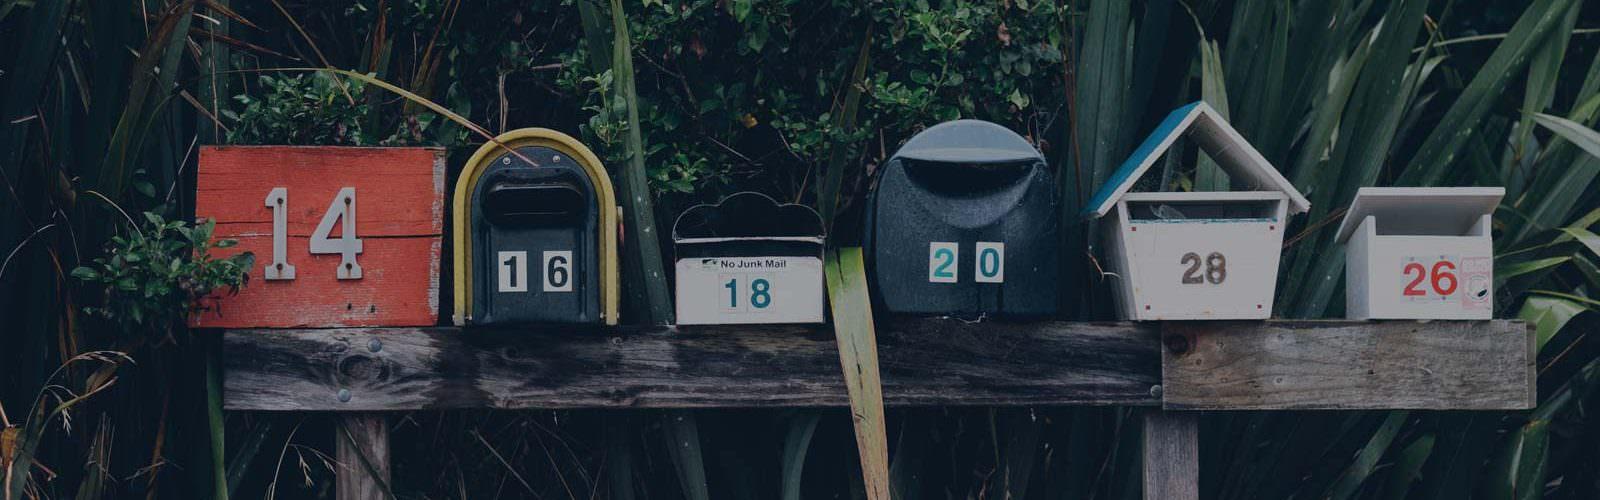 Burgoynes Mailchimp Email